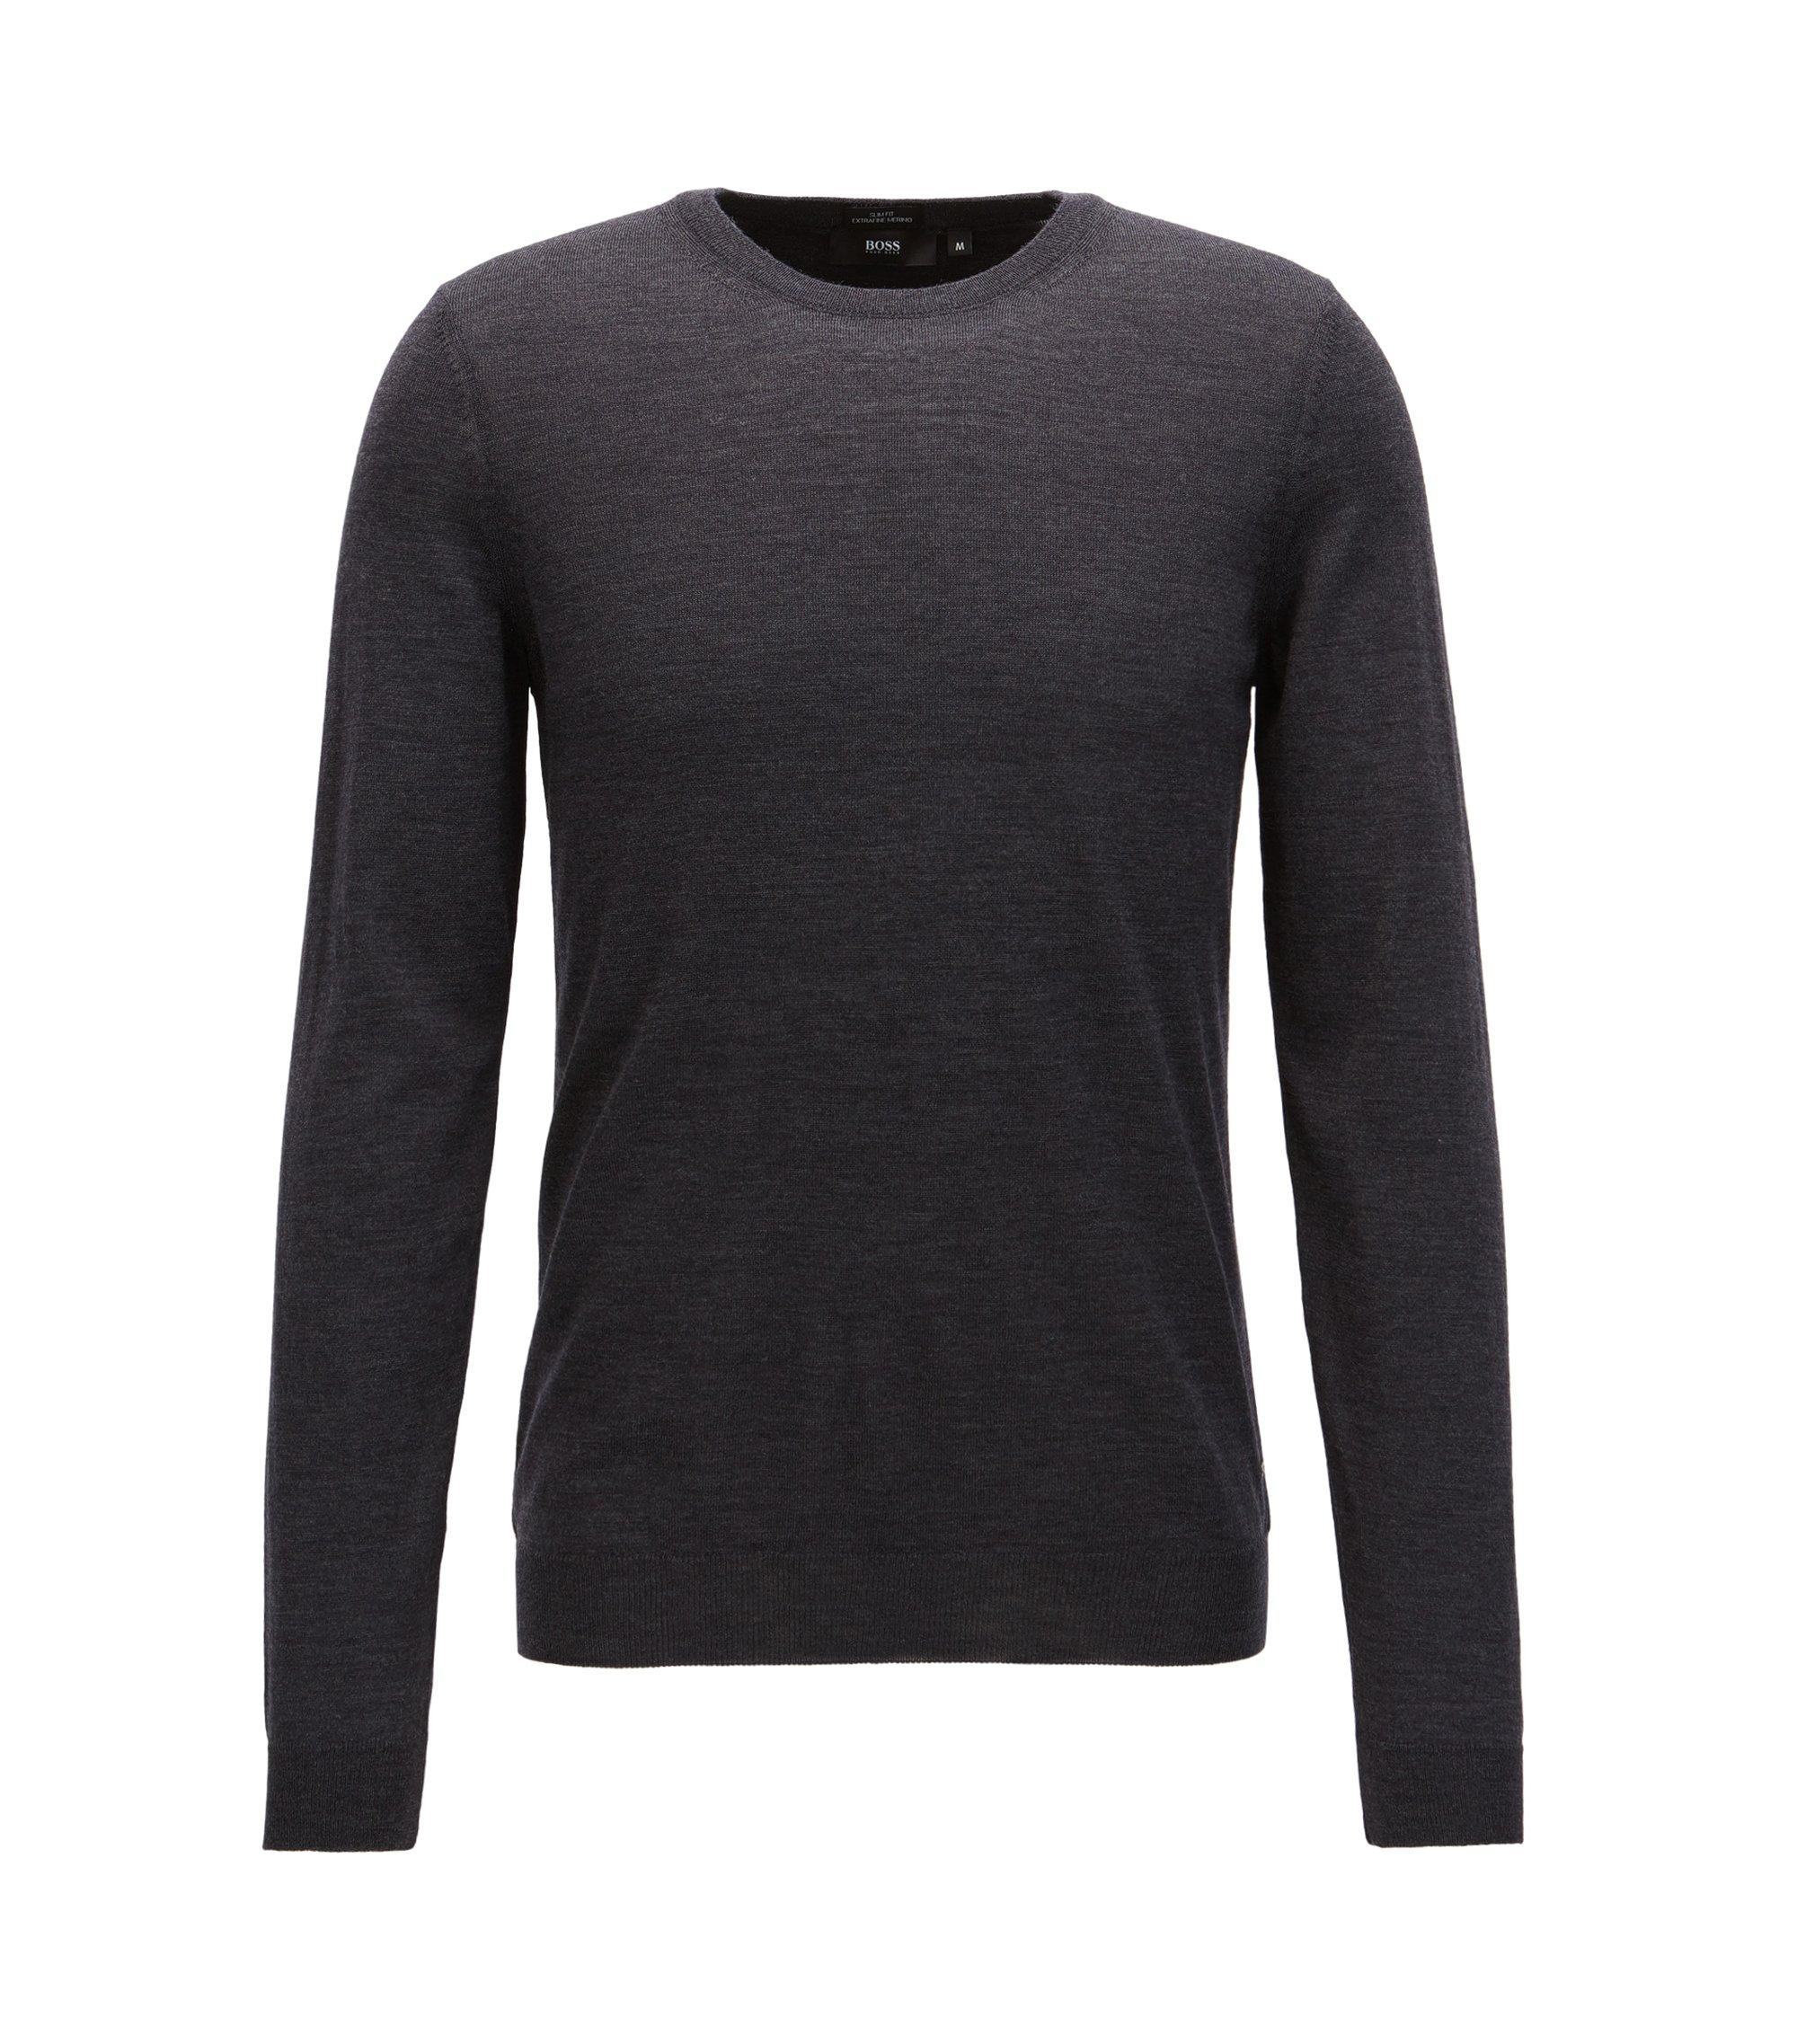 Jersey de cuello redondo en lana virgen, Gris oscuro